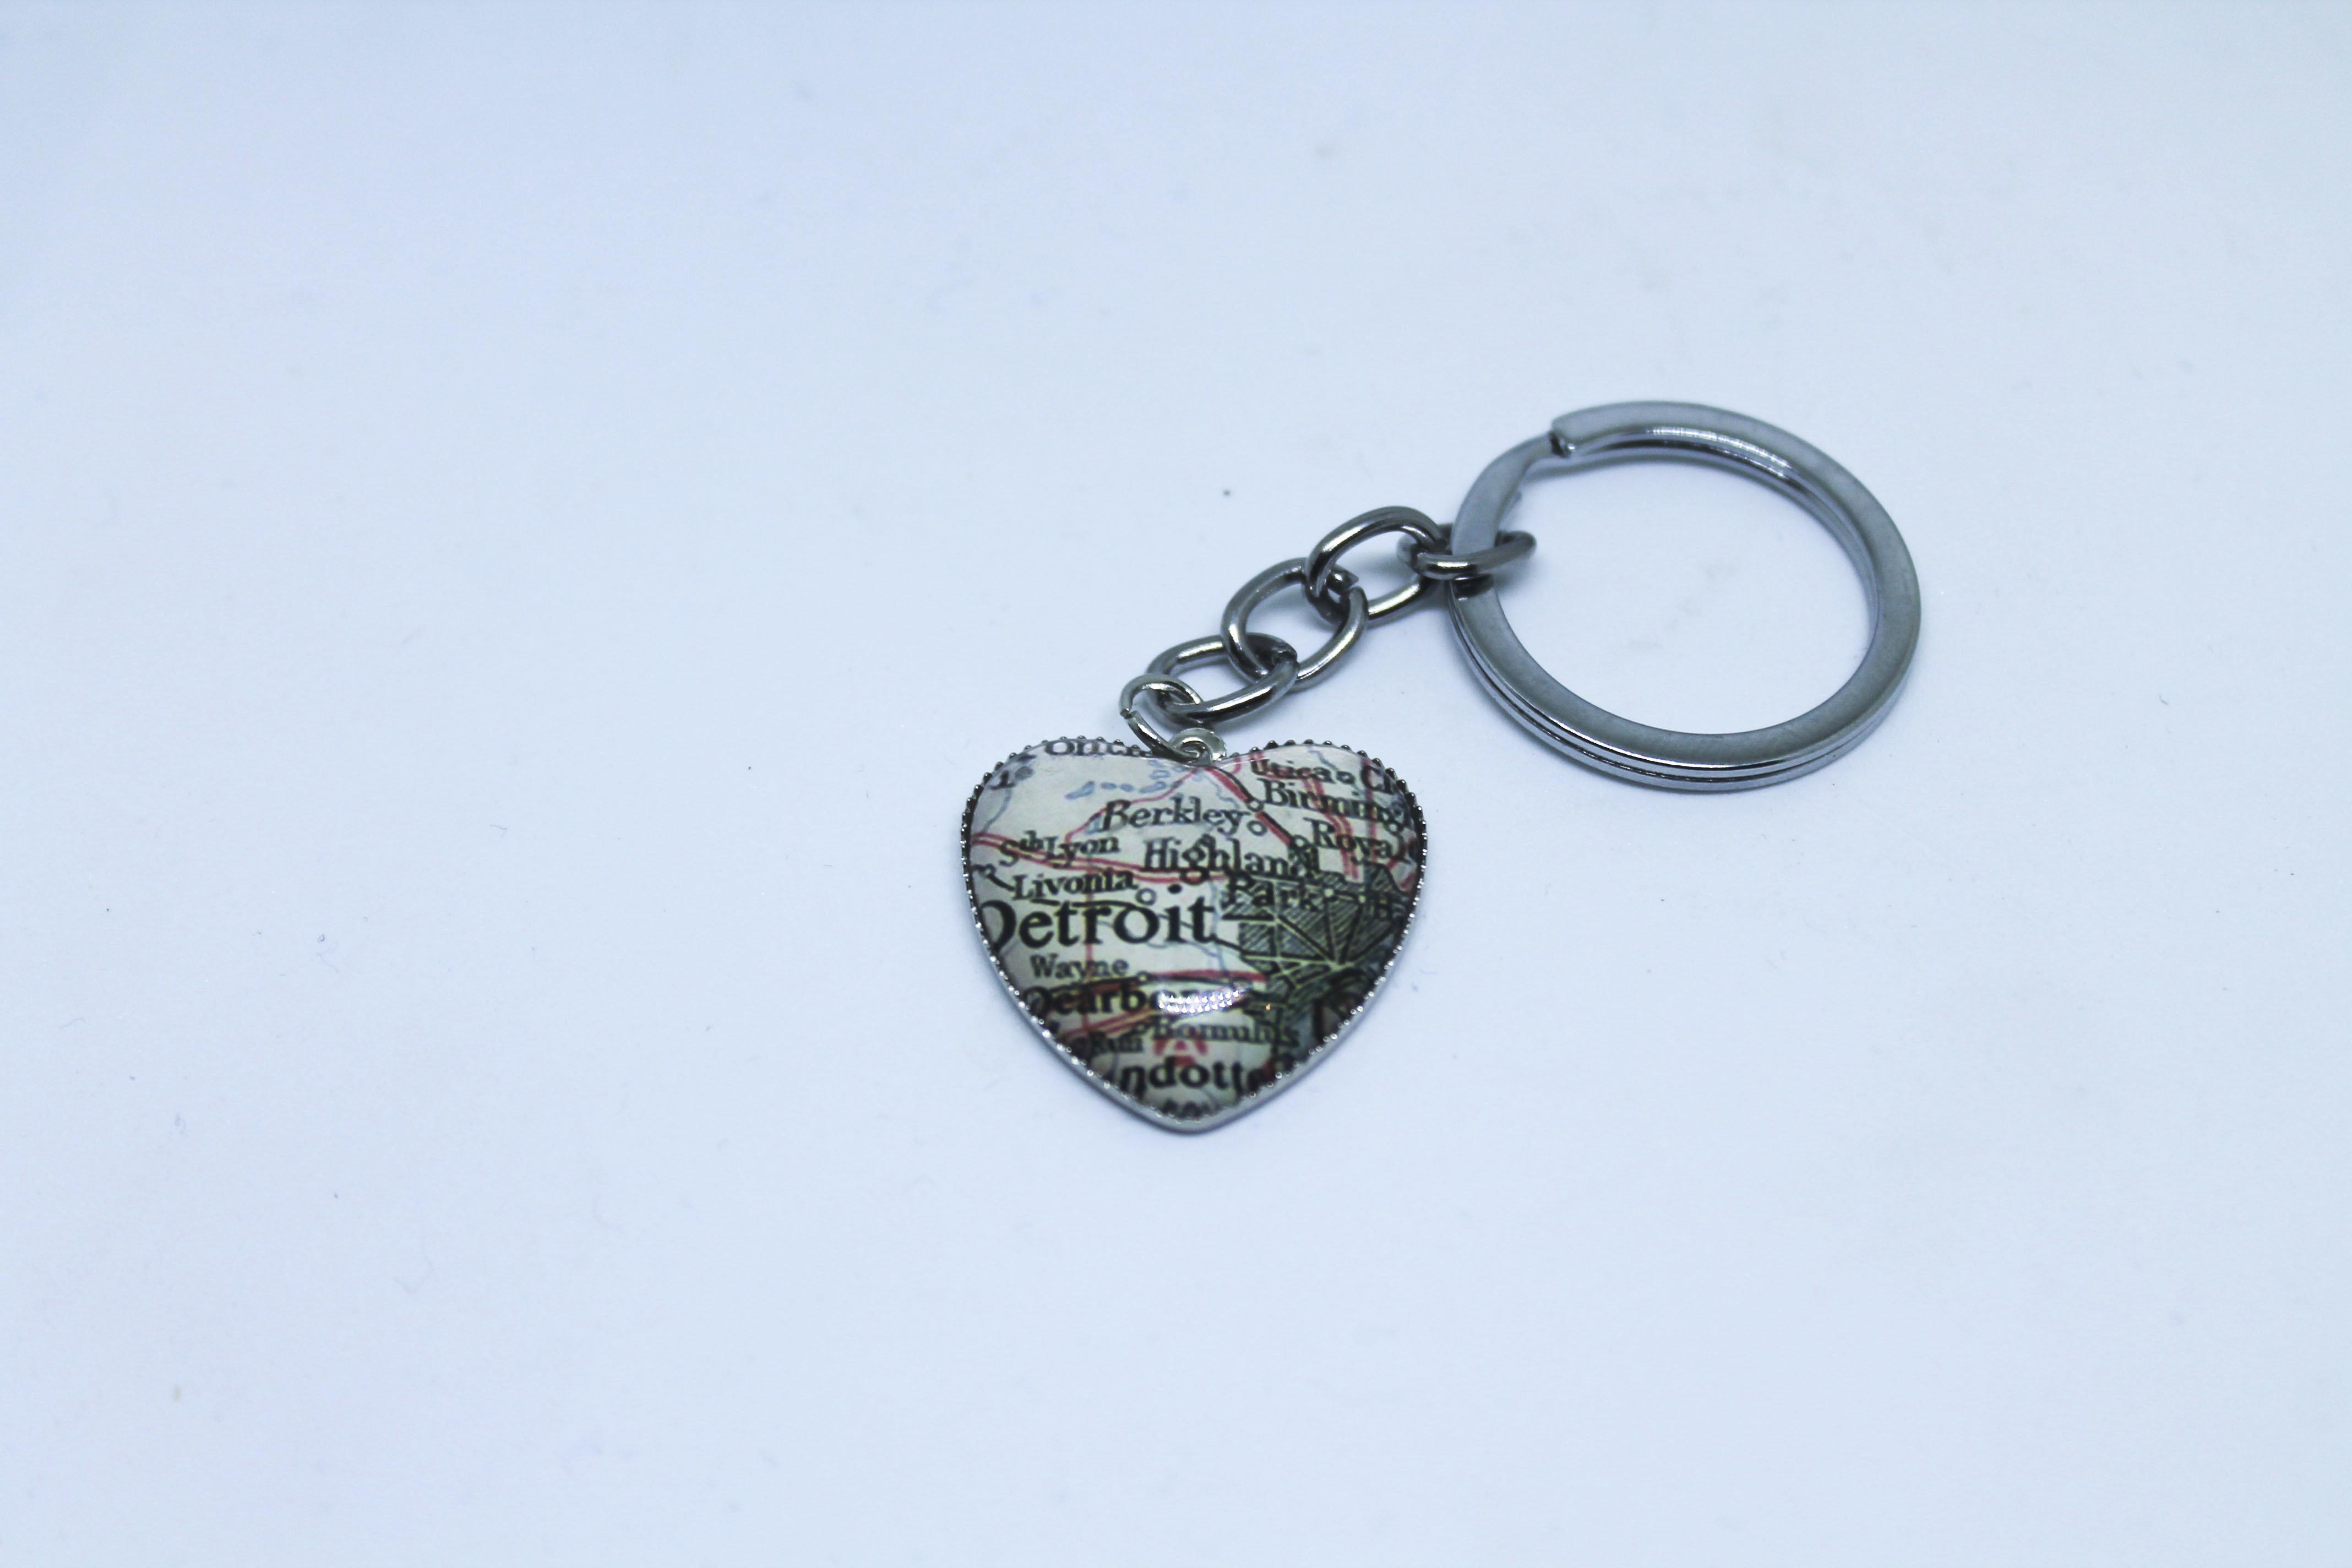 Detroit Heart Map keychain 00104